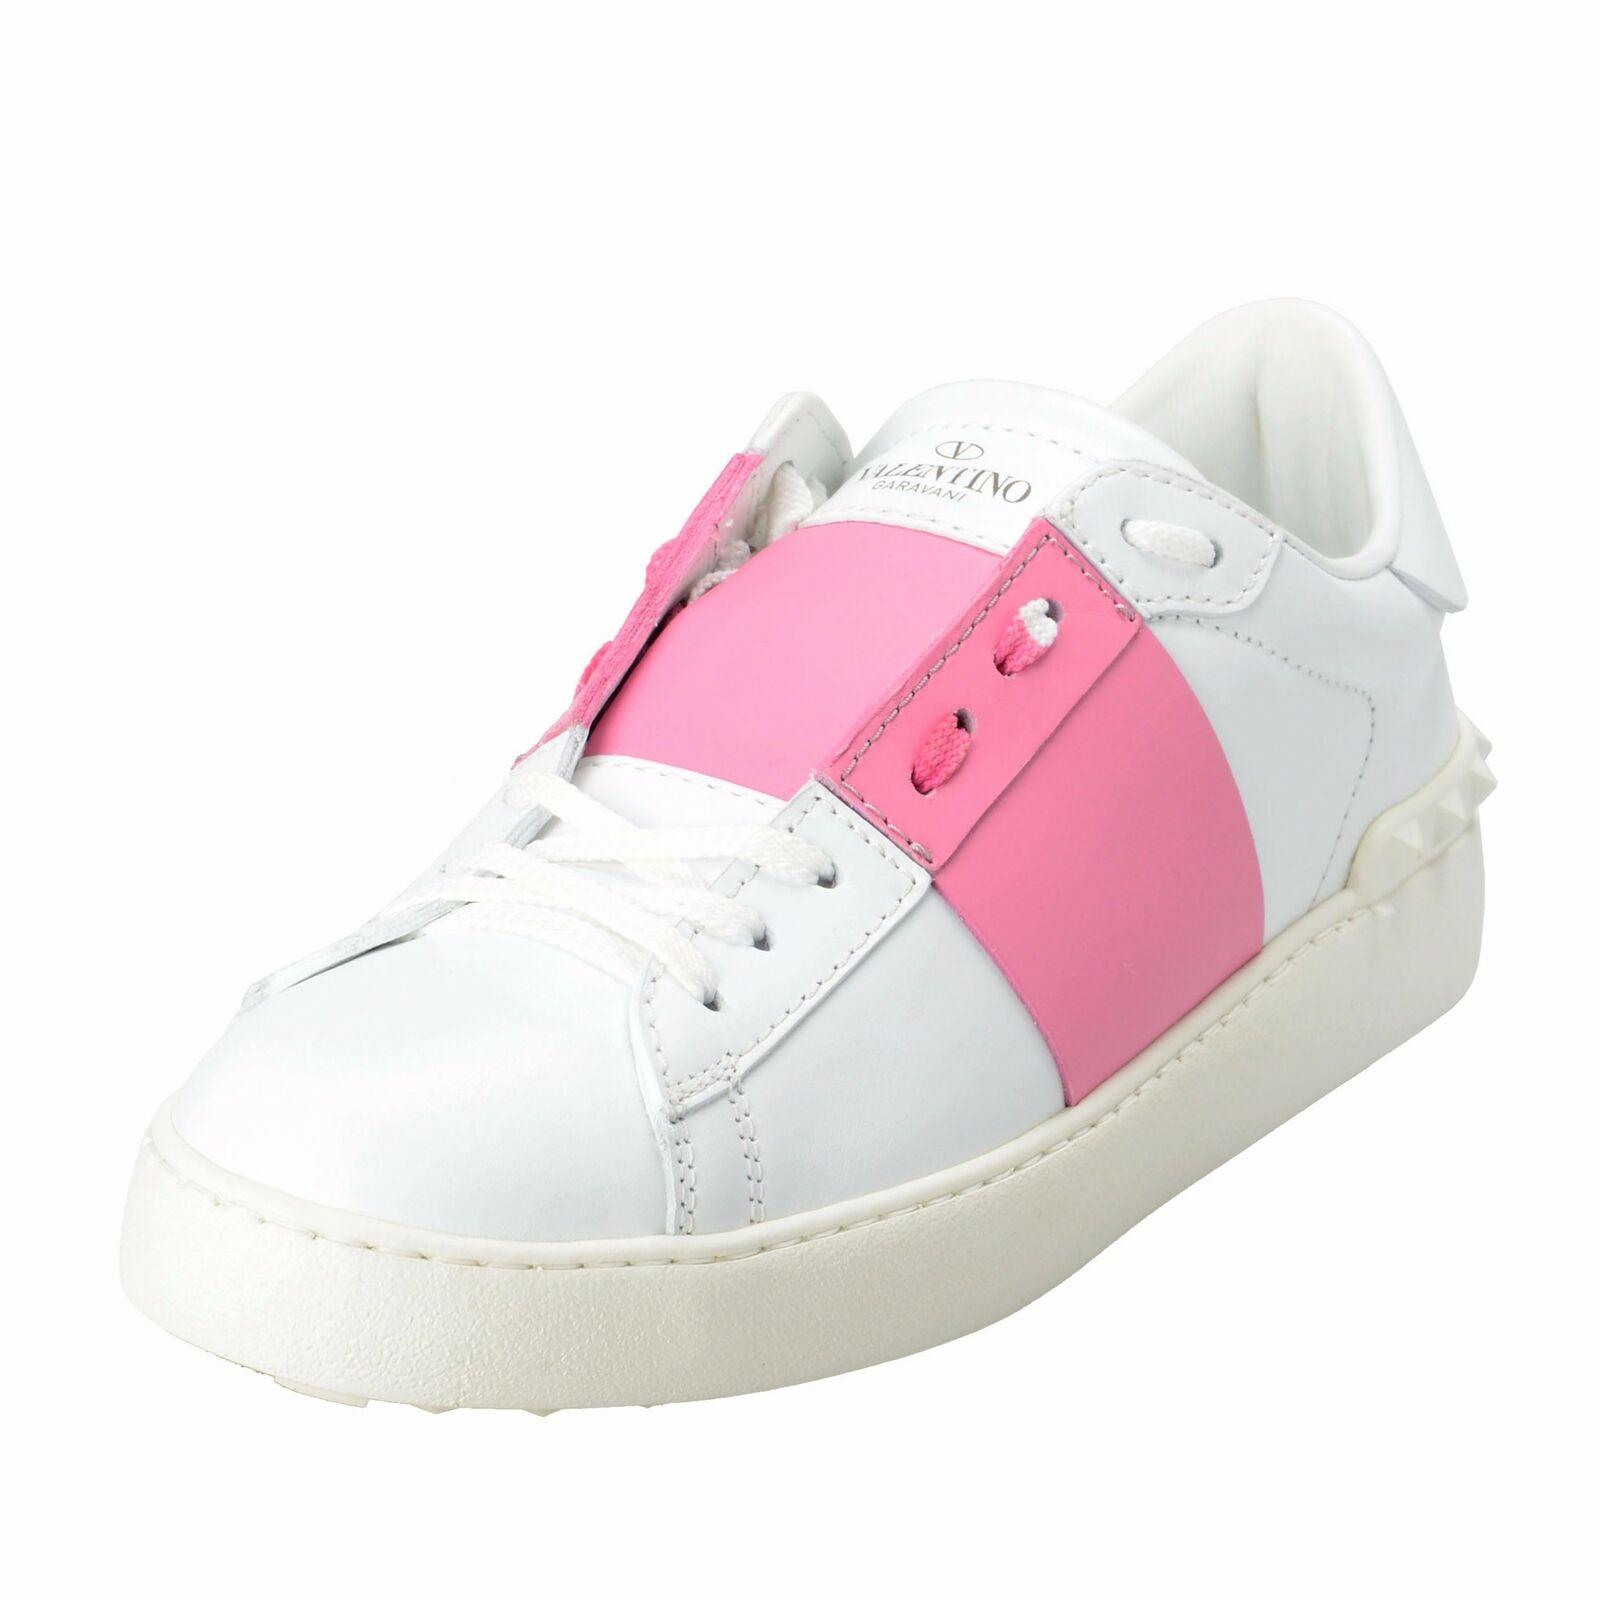 Valentino Garavani Women's Rockstud Two Tones Open Fashion Sneakers shoes